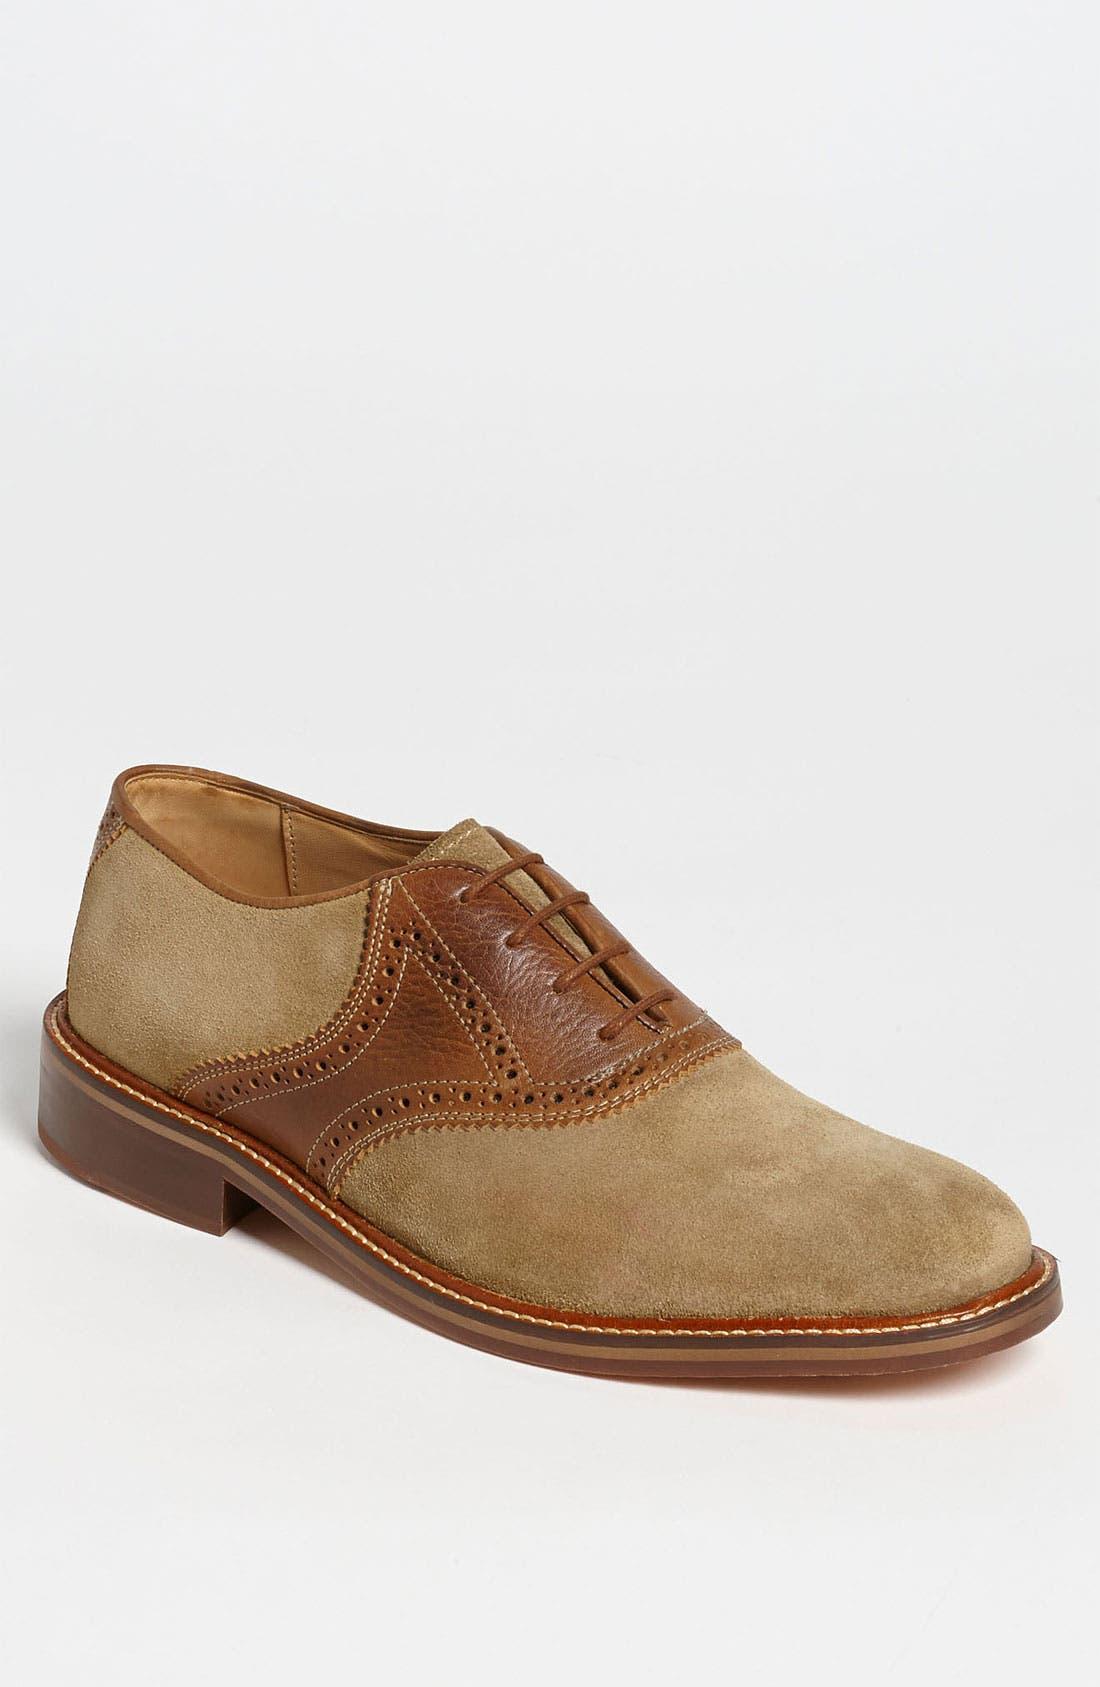 Main Image - Martin Dingman 'George' Saddle Shoe